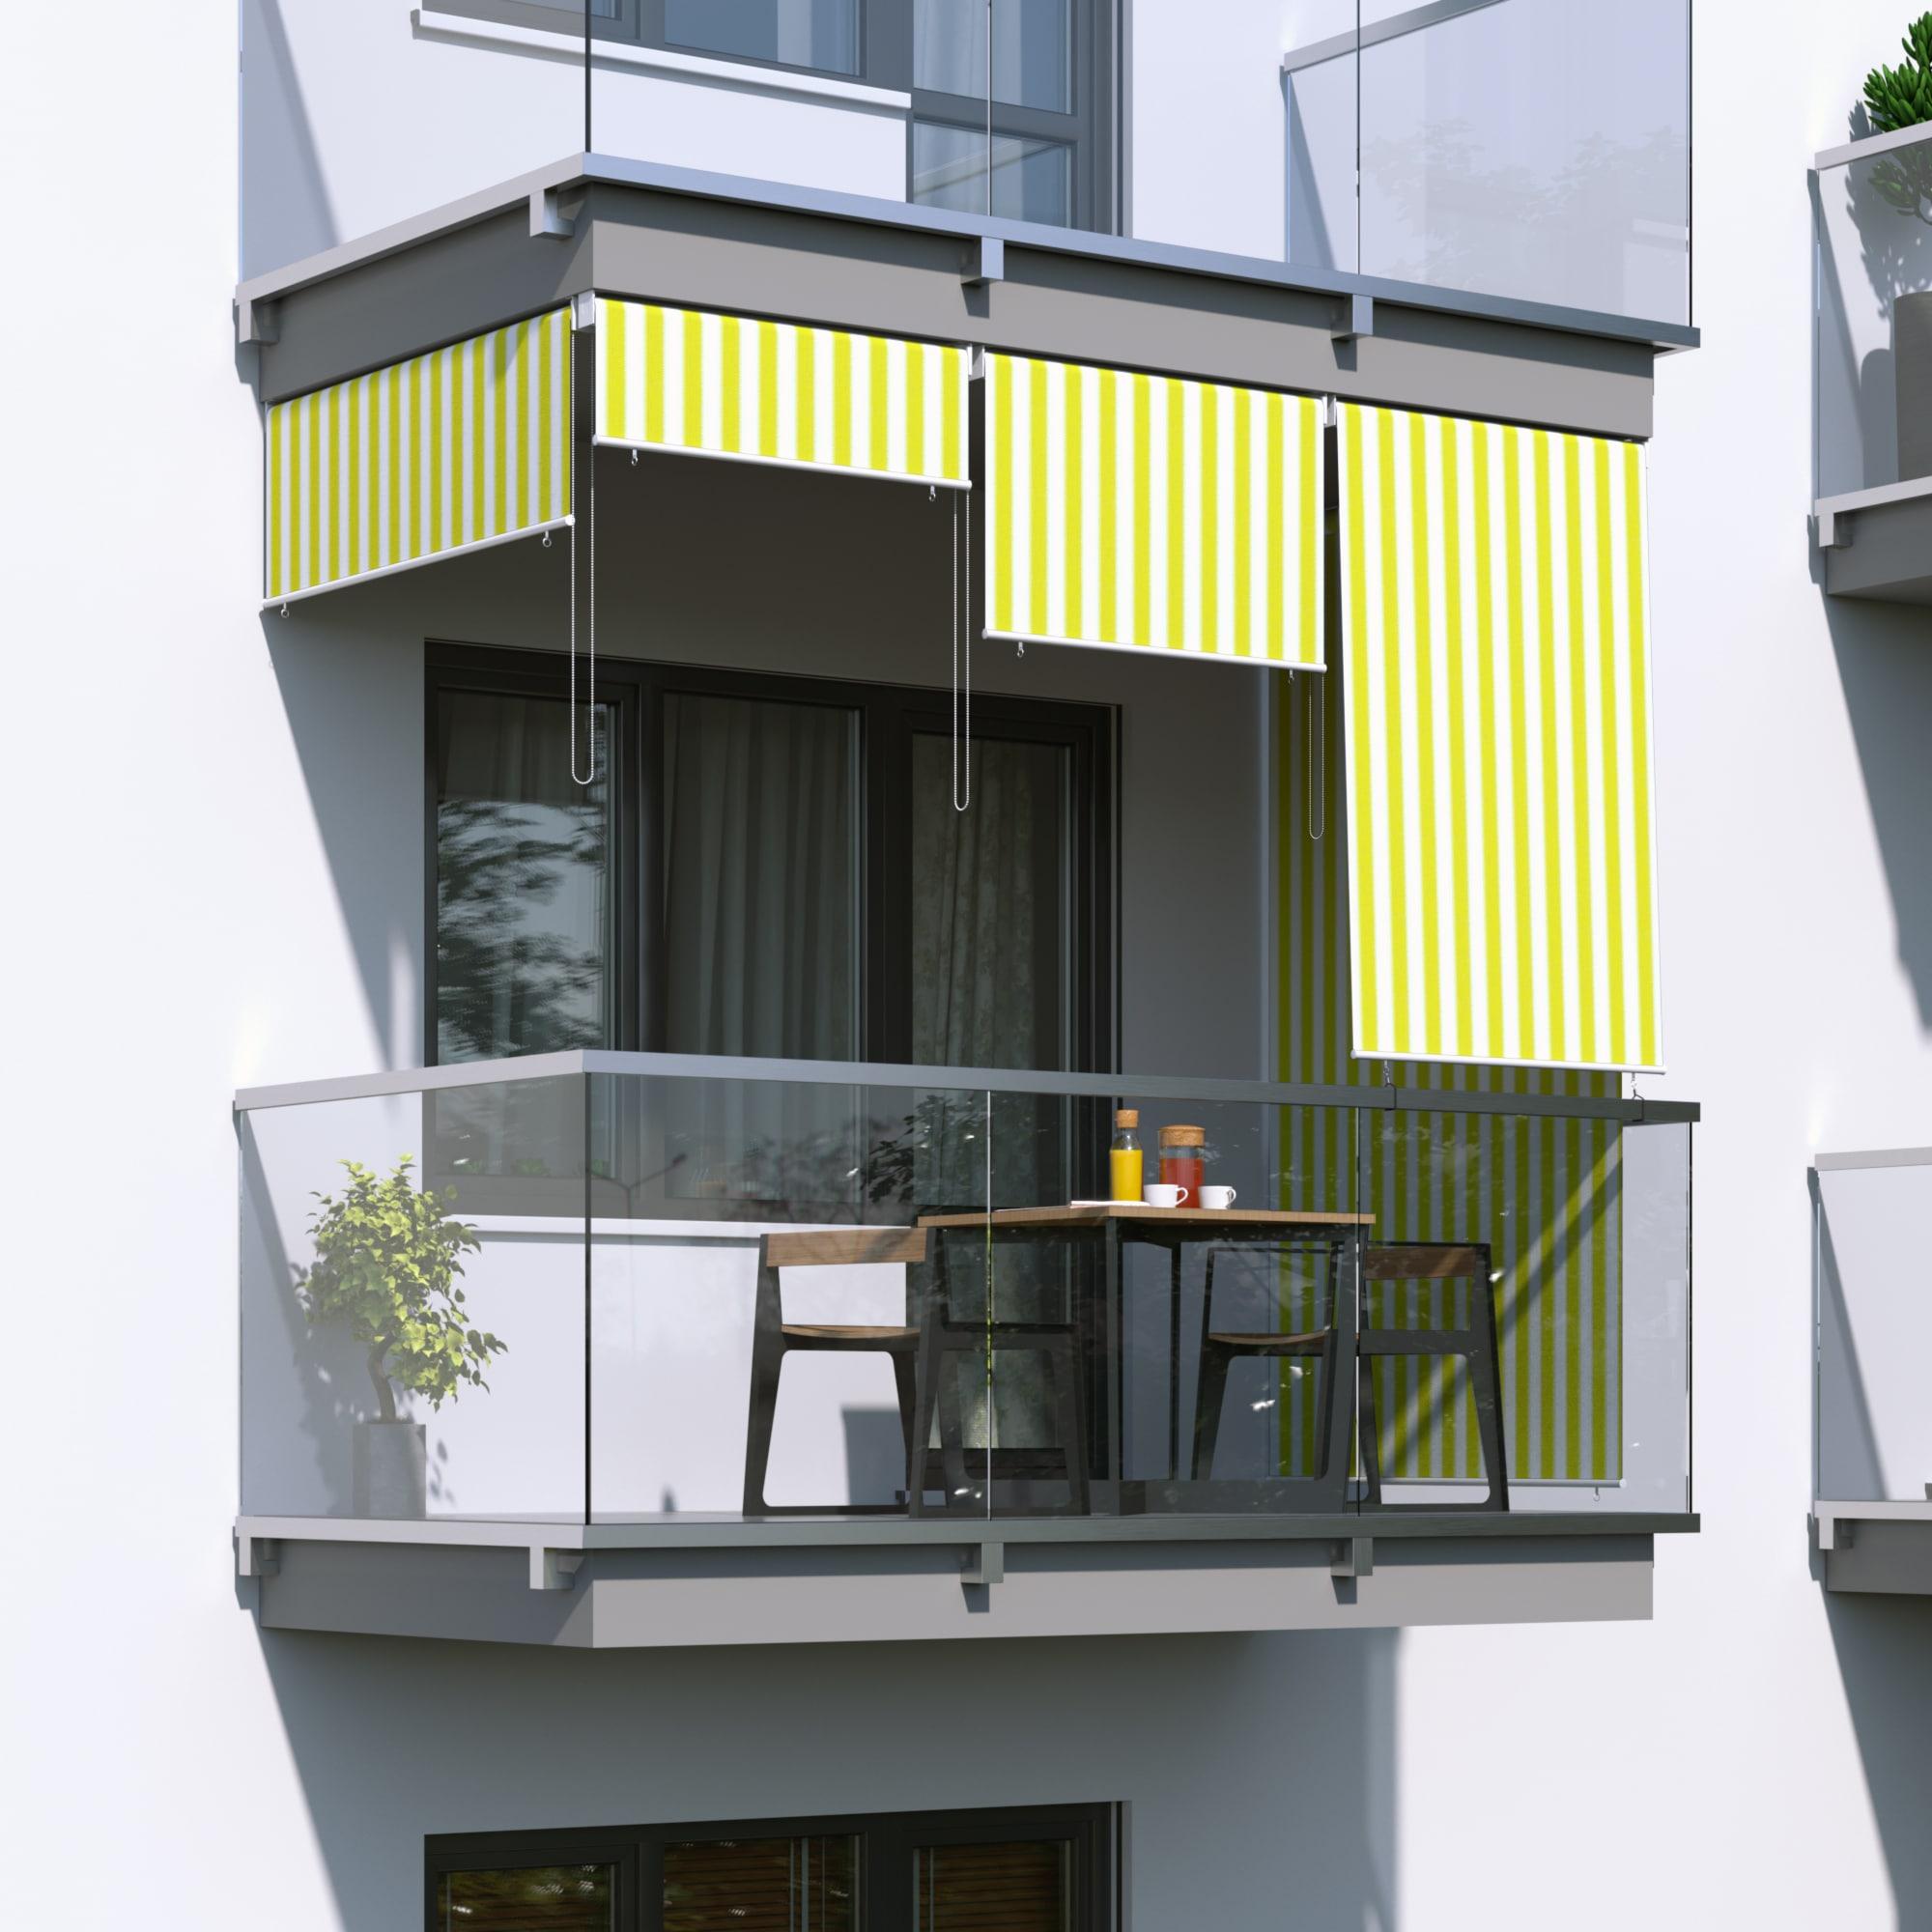 au enrollo balkon senkrechtmarkise 100 x 140cm gelb wei jarolift. Black Bedroom Furniture Sets. Home Design Ideas